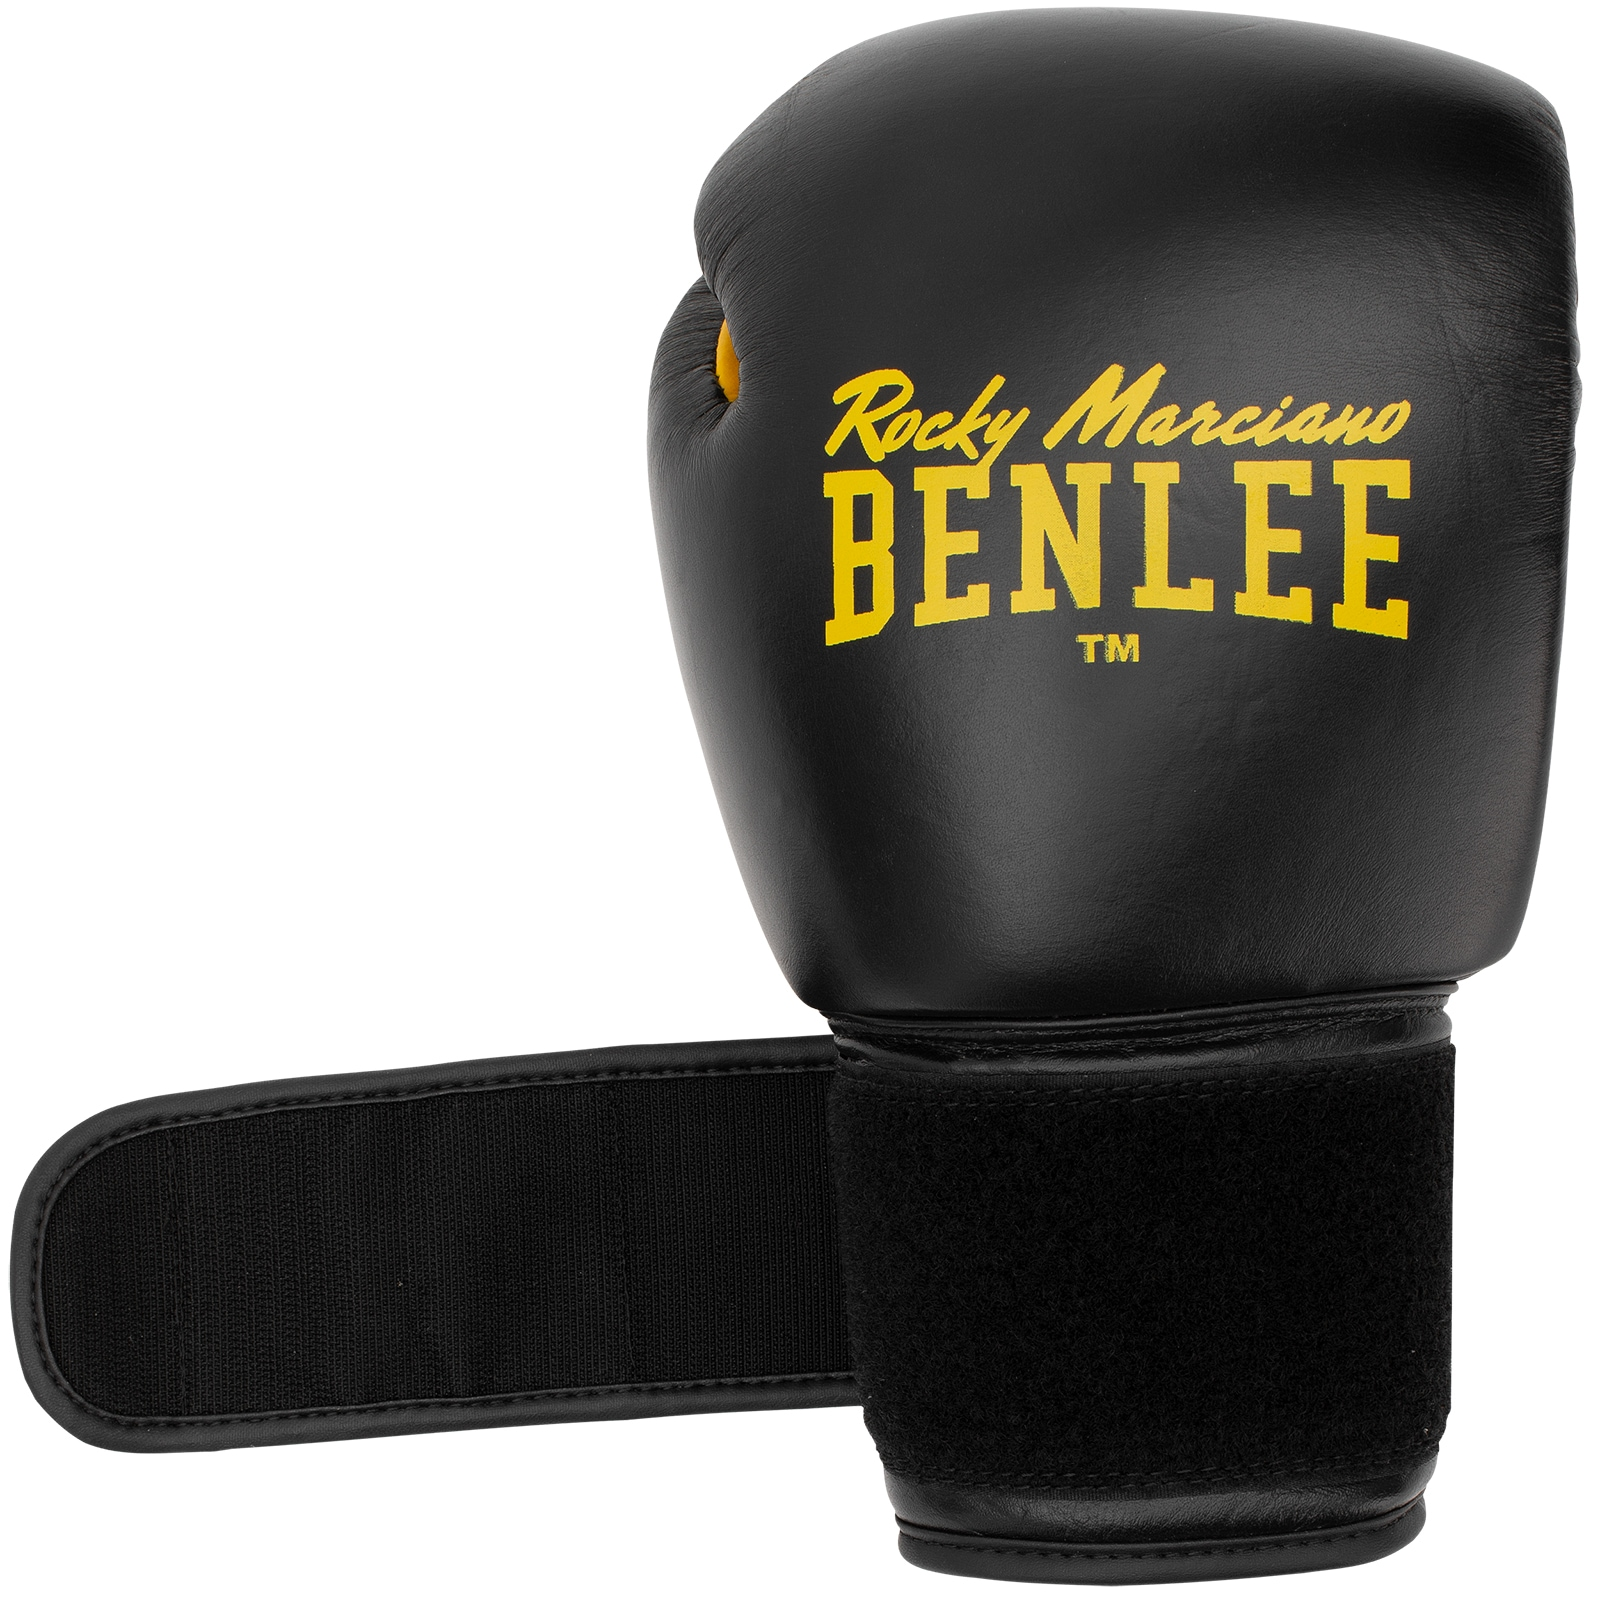 Benlee Rocky Marciano Boxhandschuhe DRACO | Accessoires > Handschuhe > Sonstige Handschuhe | Benlee Rocky Marciano